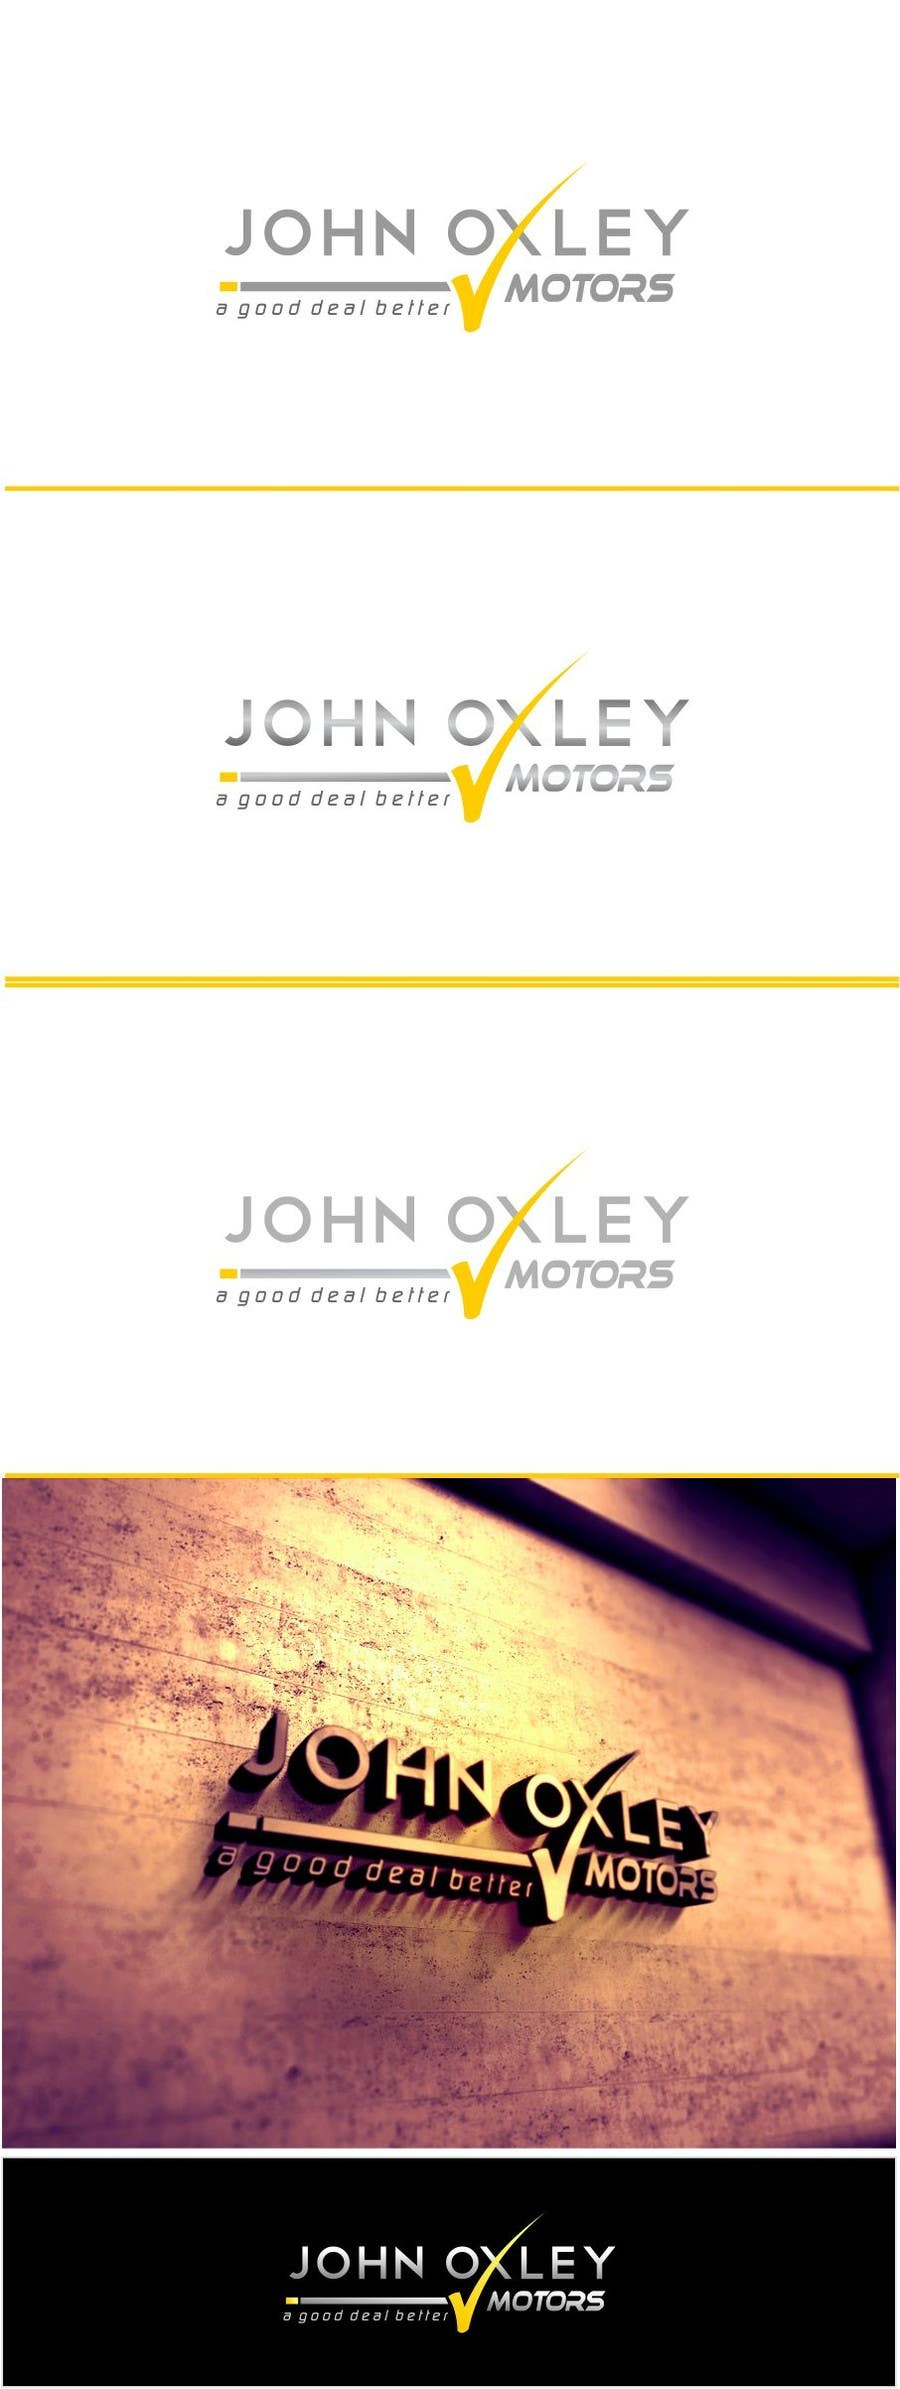 #290 for Design a Logo for John Oxley Motors by timedsgn